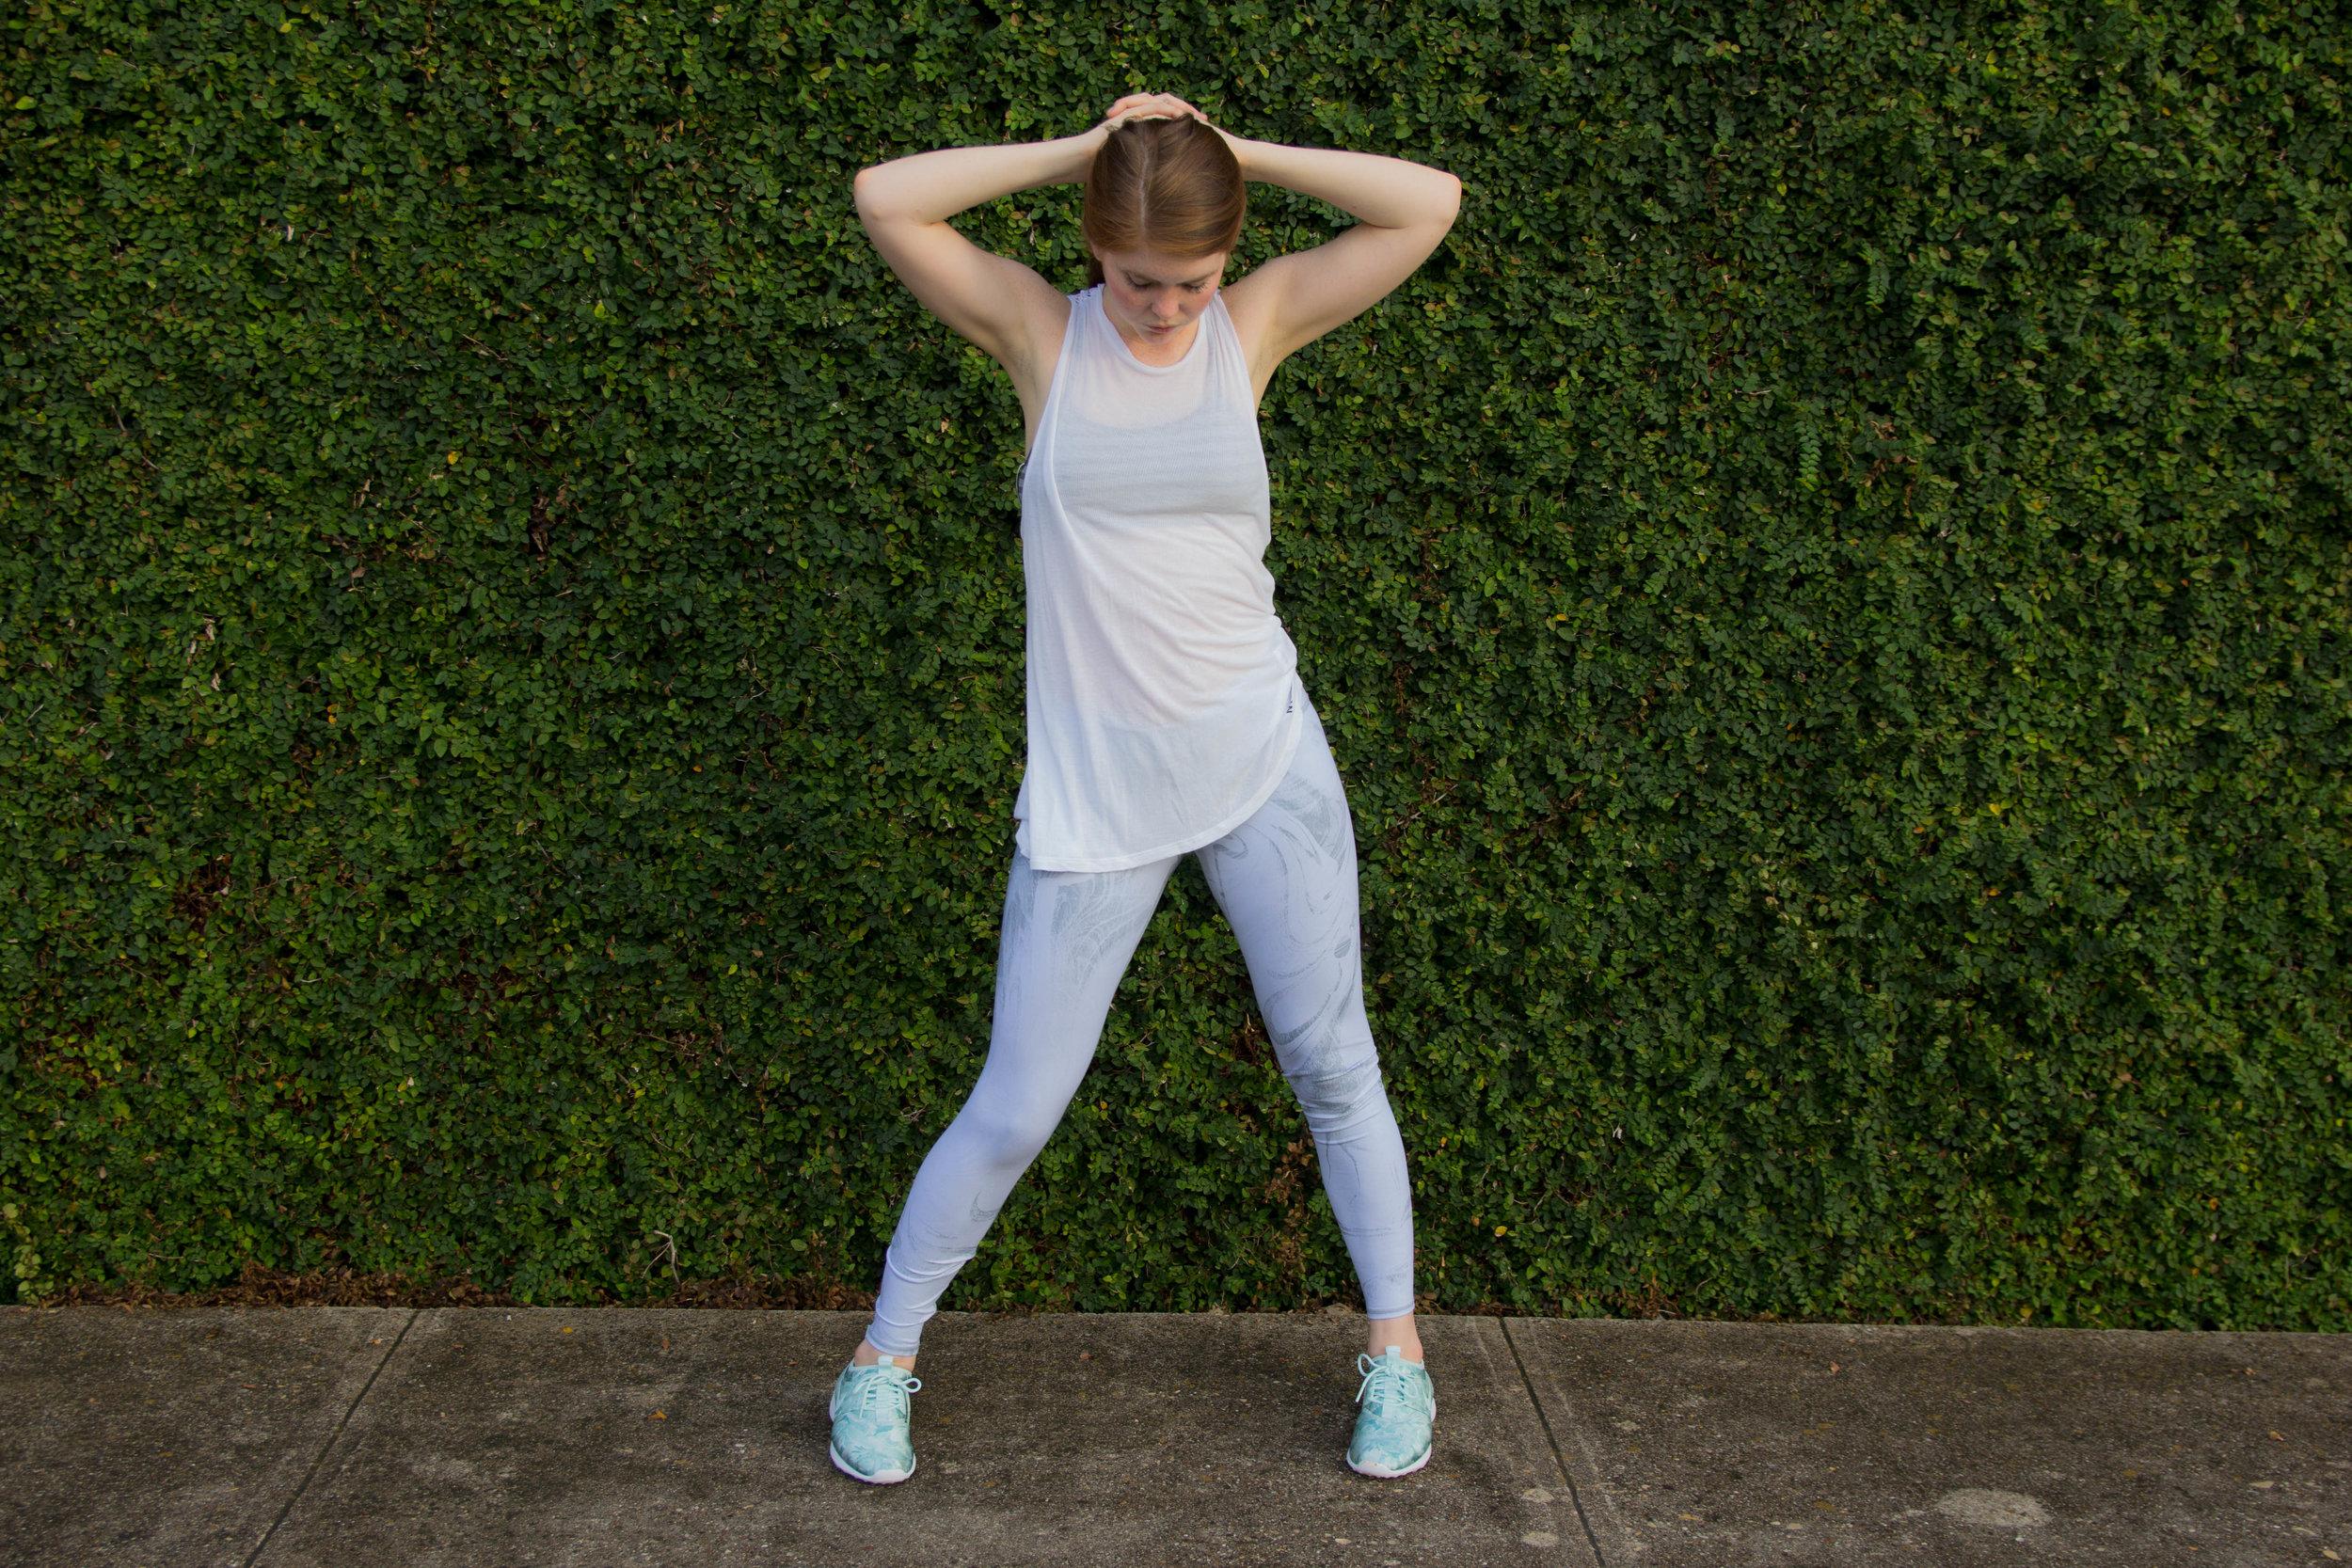 spire fitness tracker, ivy parktank top, alo yoga marble leggings, nike juvenate tennis shoes